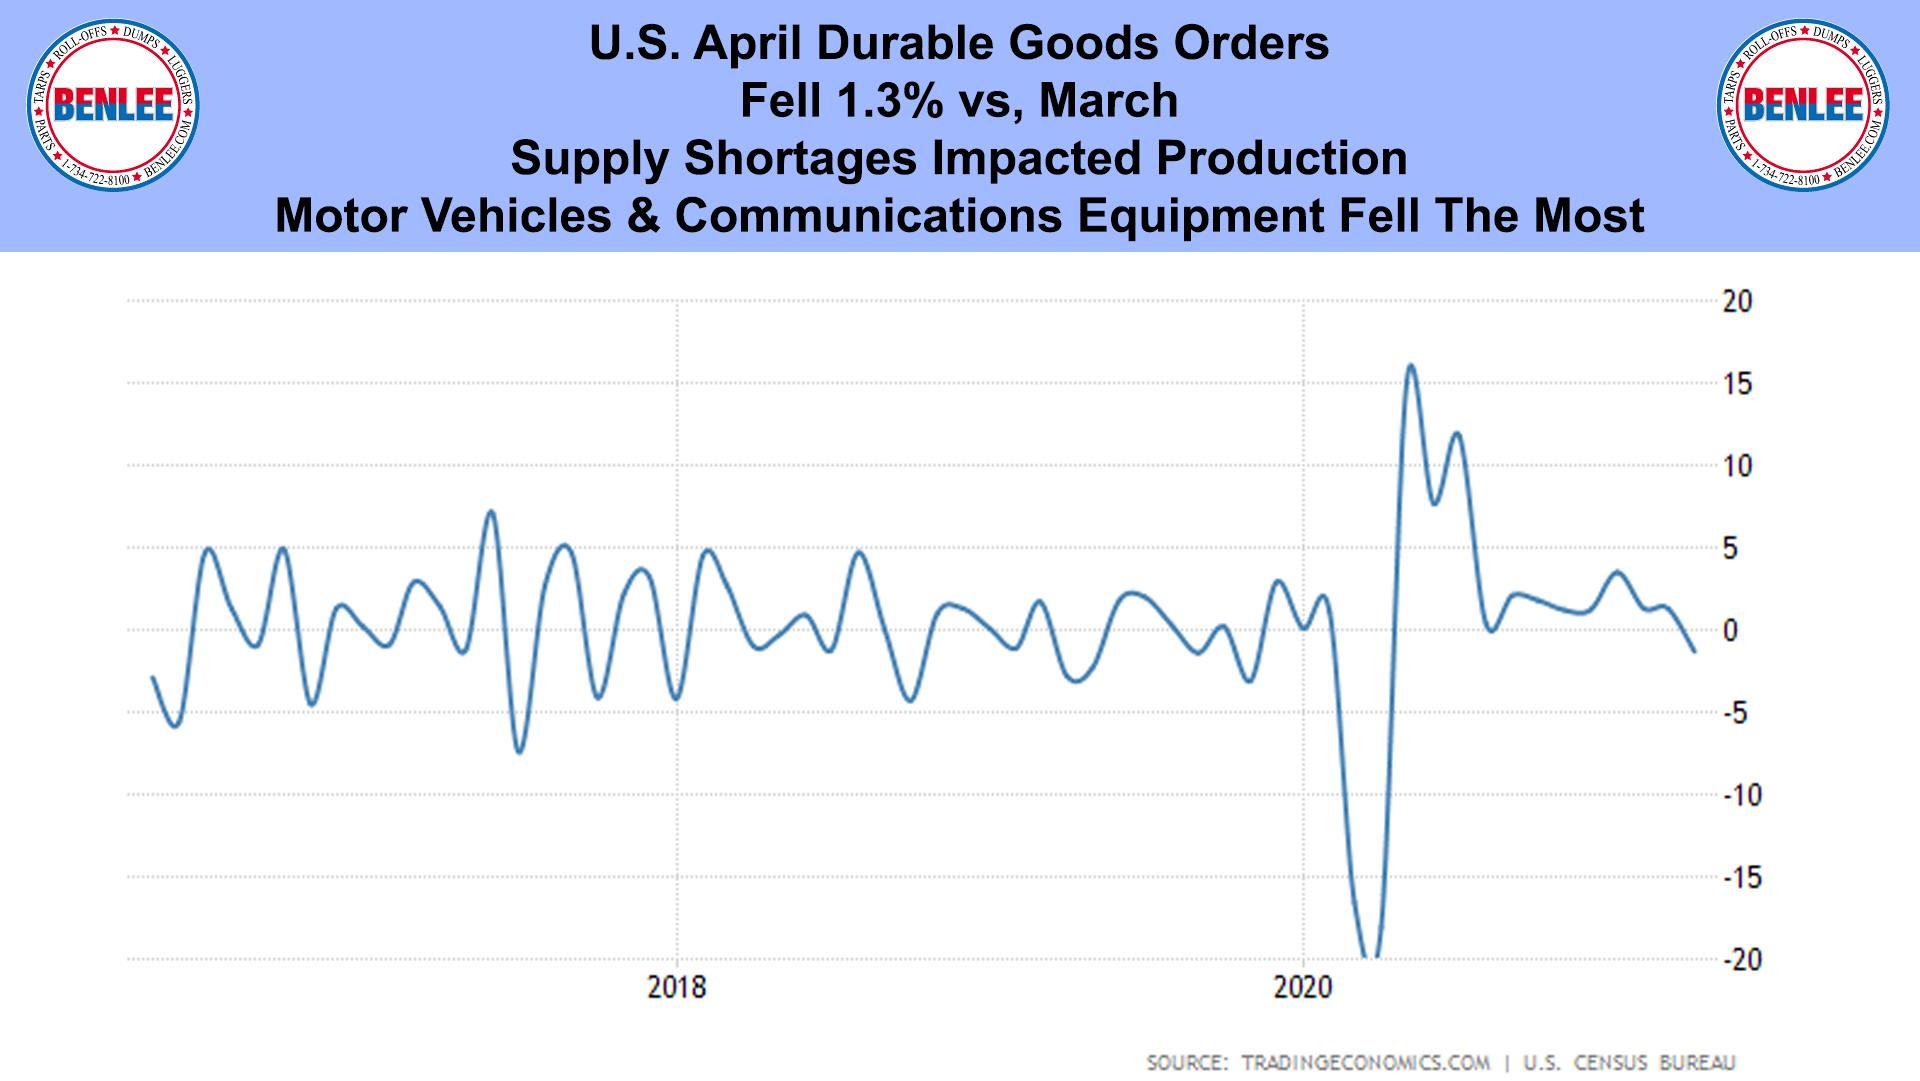 U.S. April Durable Goods Orders